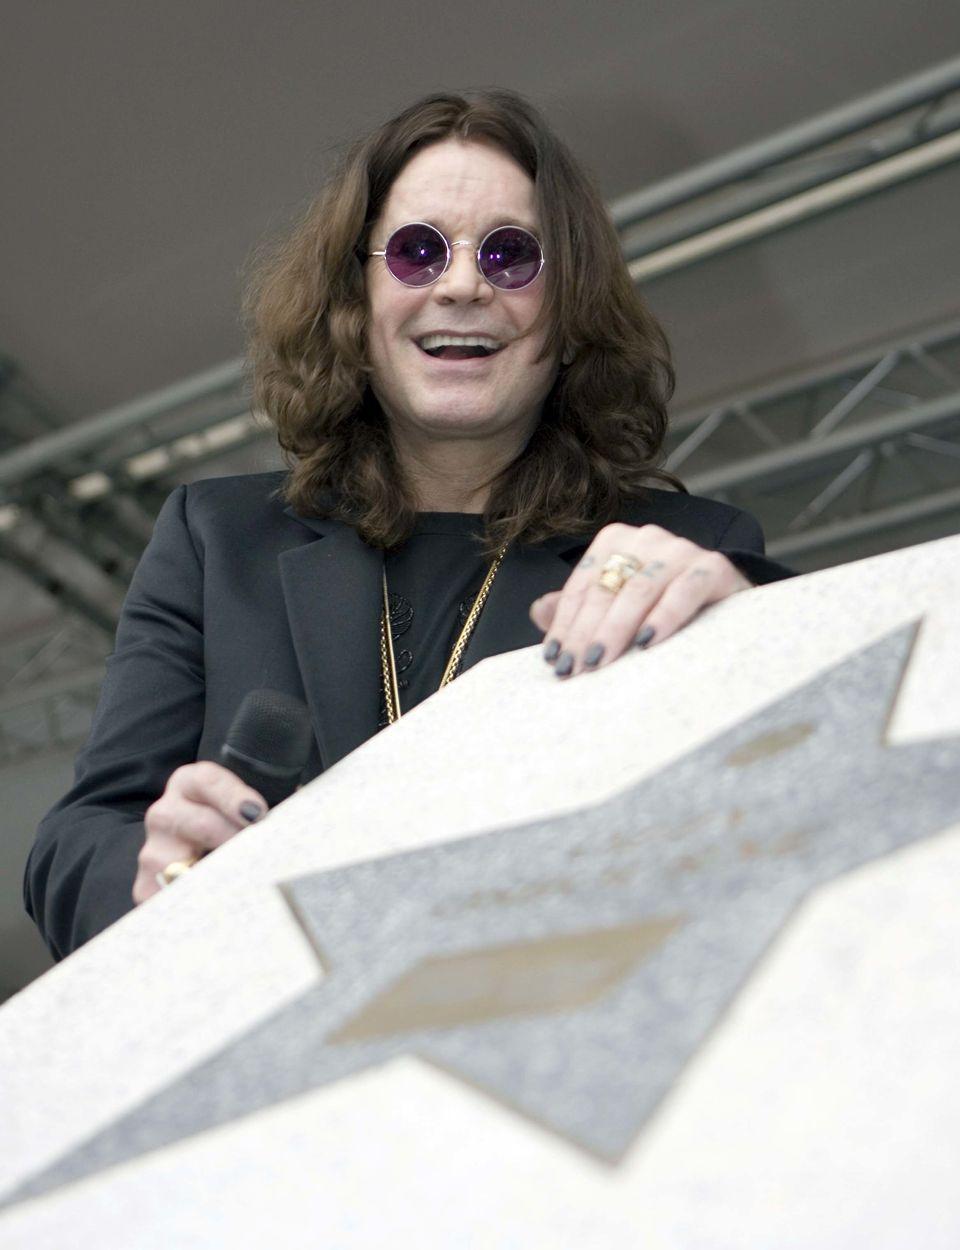 Ozzy was awarded a star on Birmingham's Walk Of Stars in